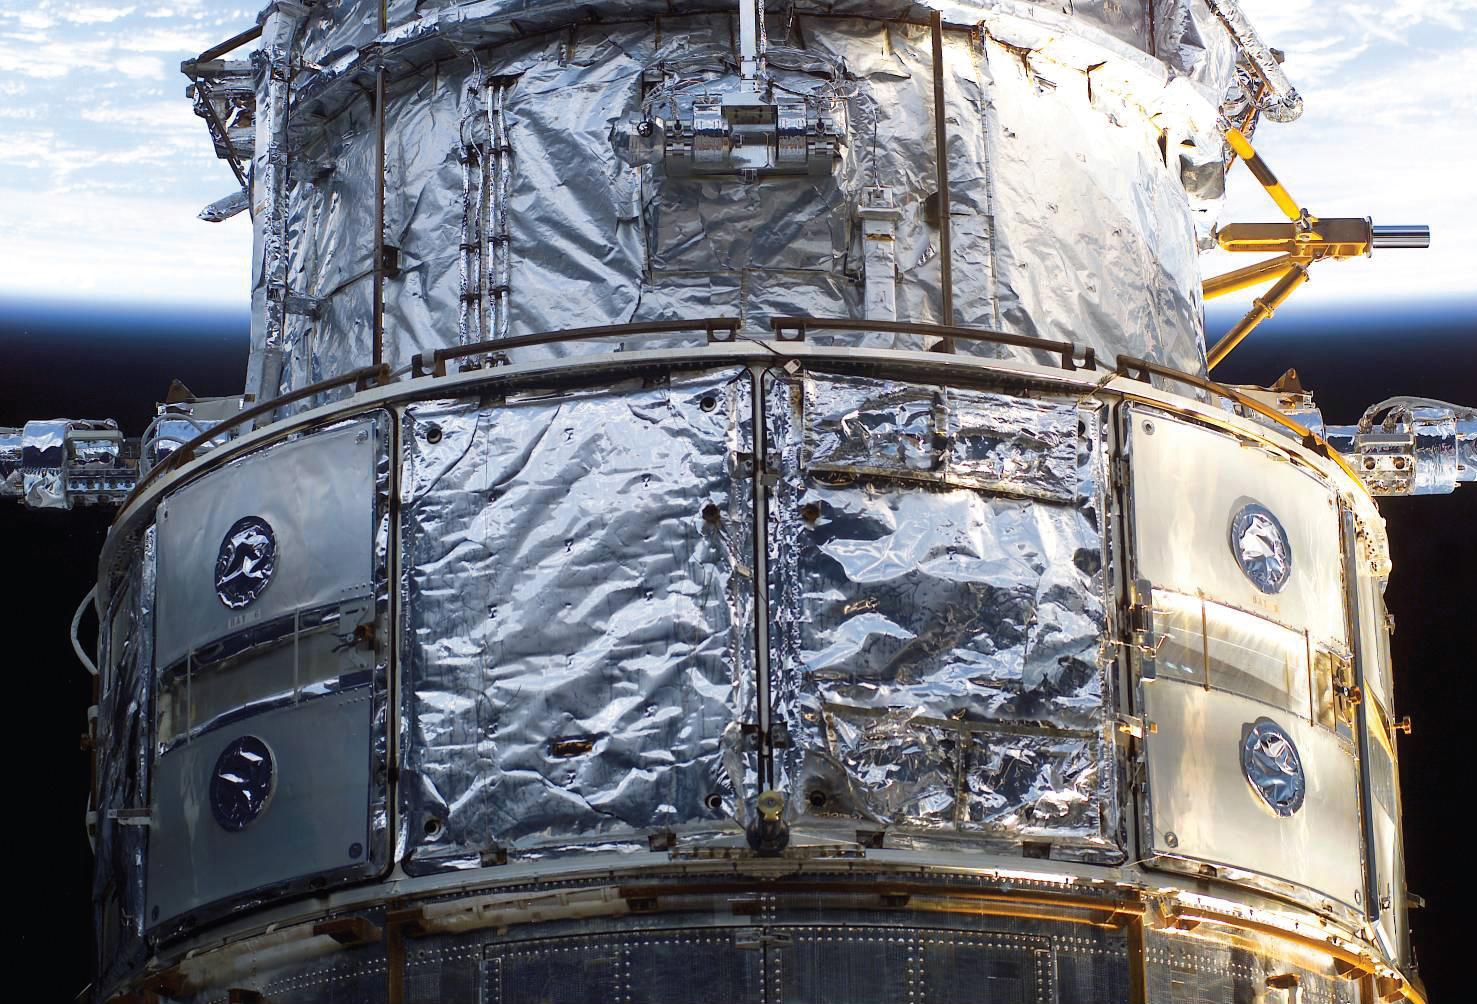 Nasa Hubble Space Telescope Servicing Mission 4 New